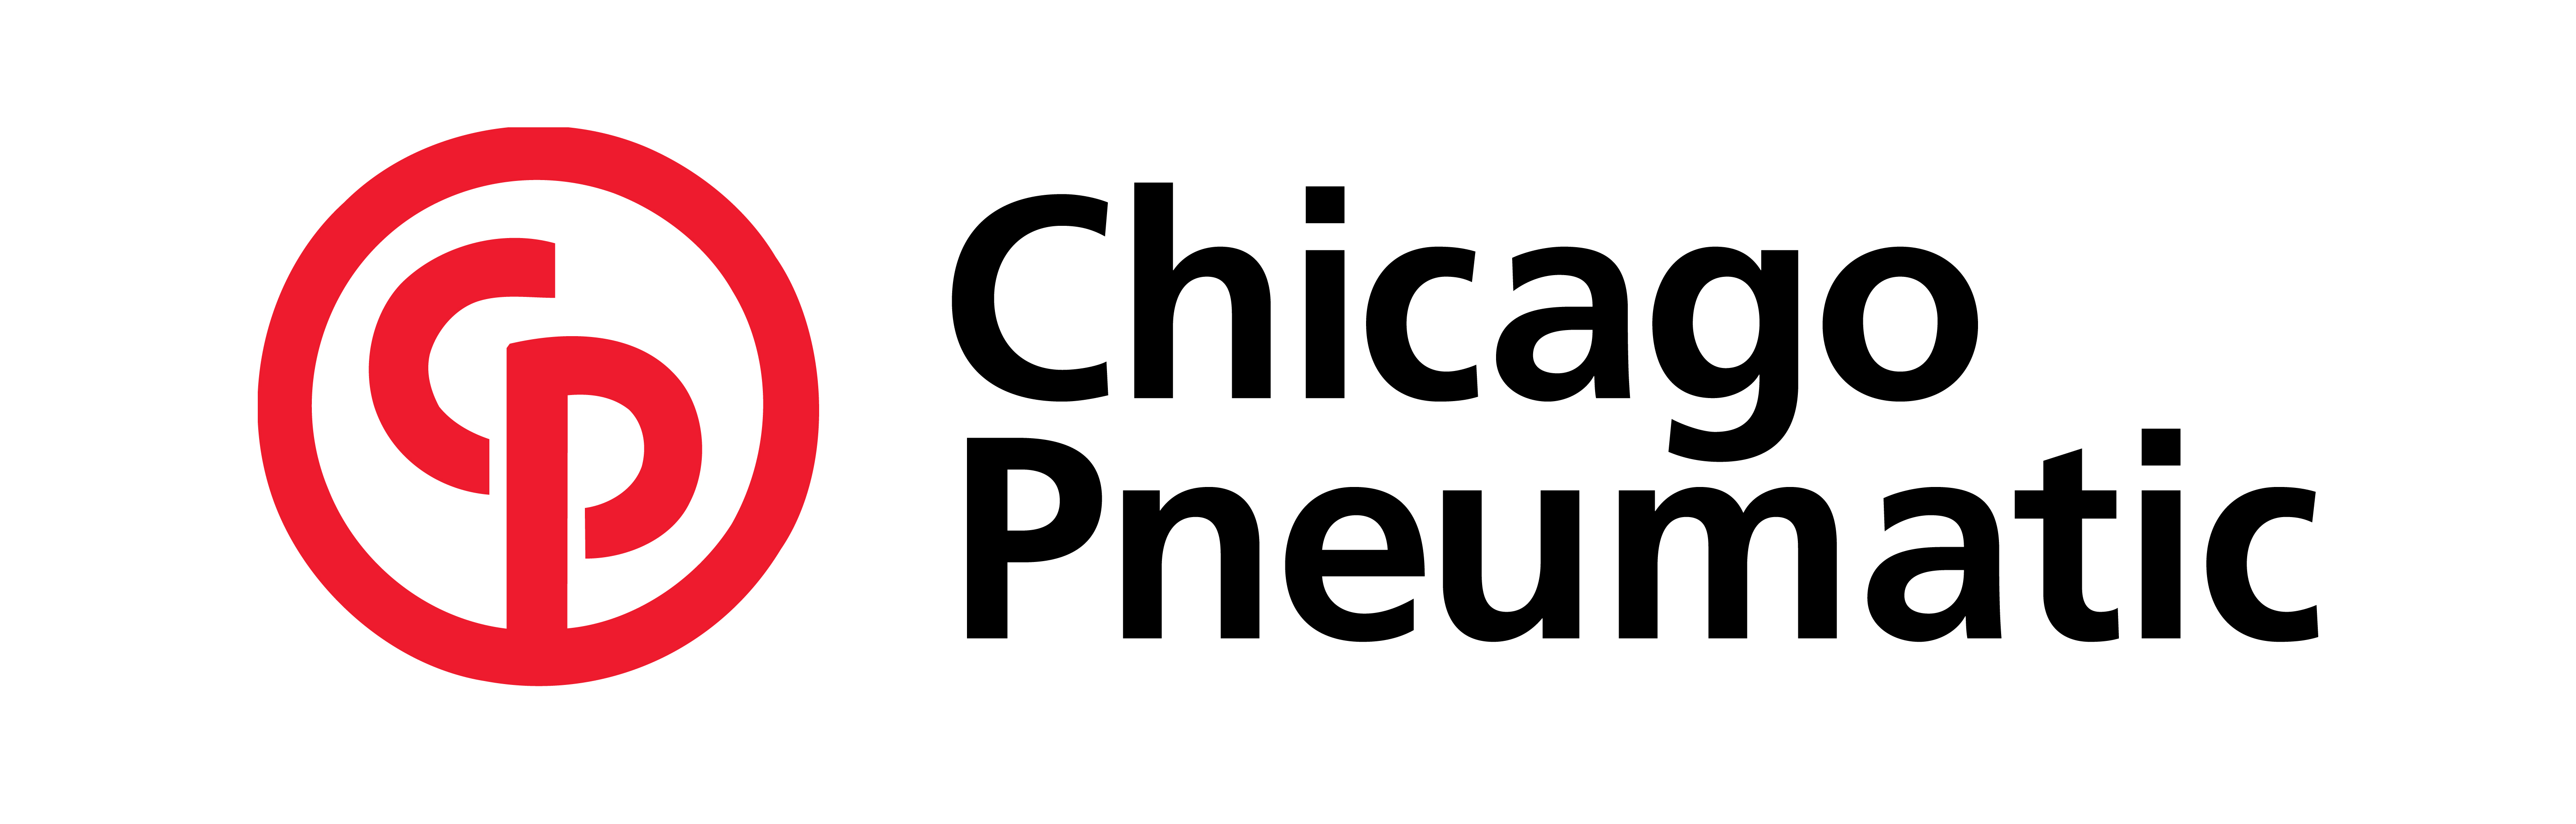 Logo CP Chicago Pneumatic Color_hi res